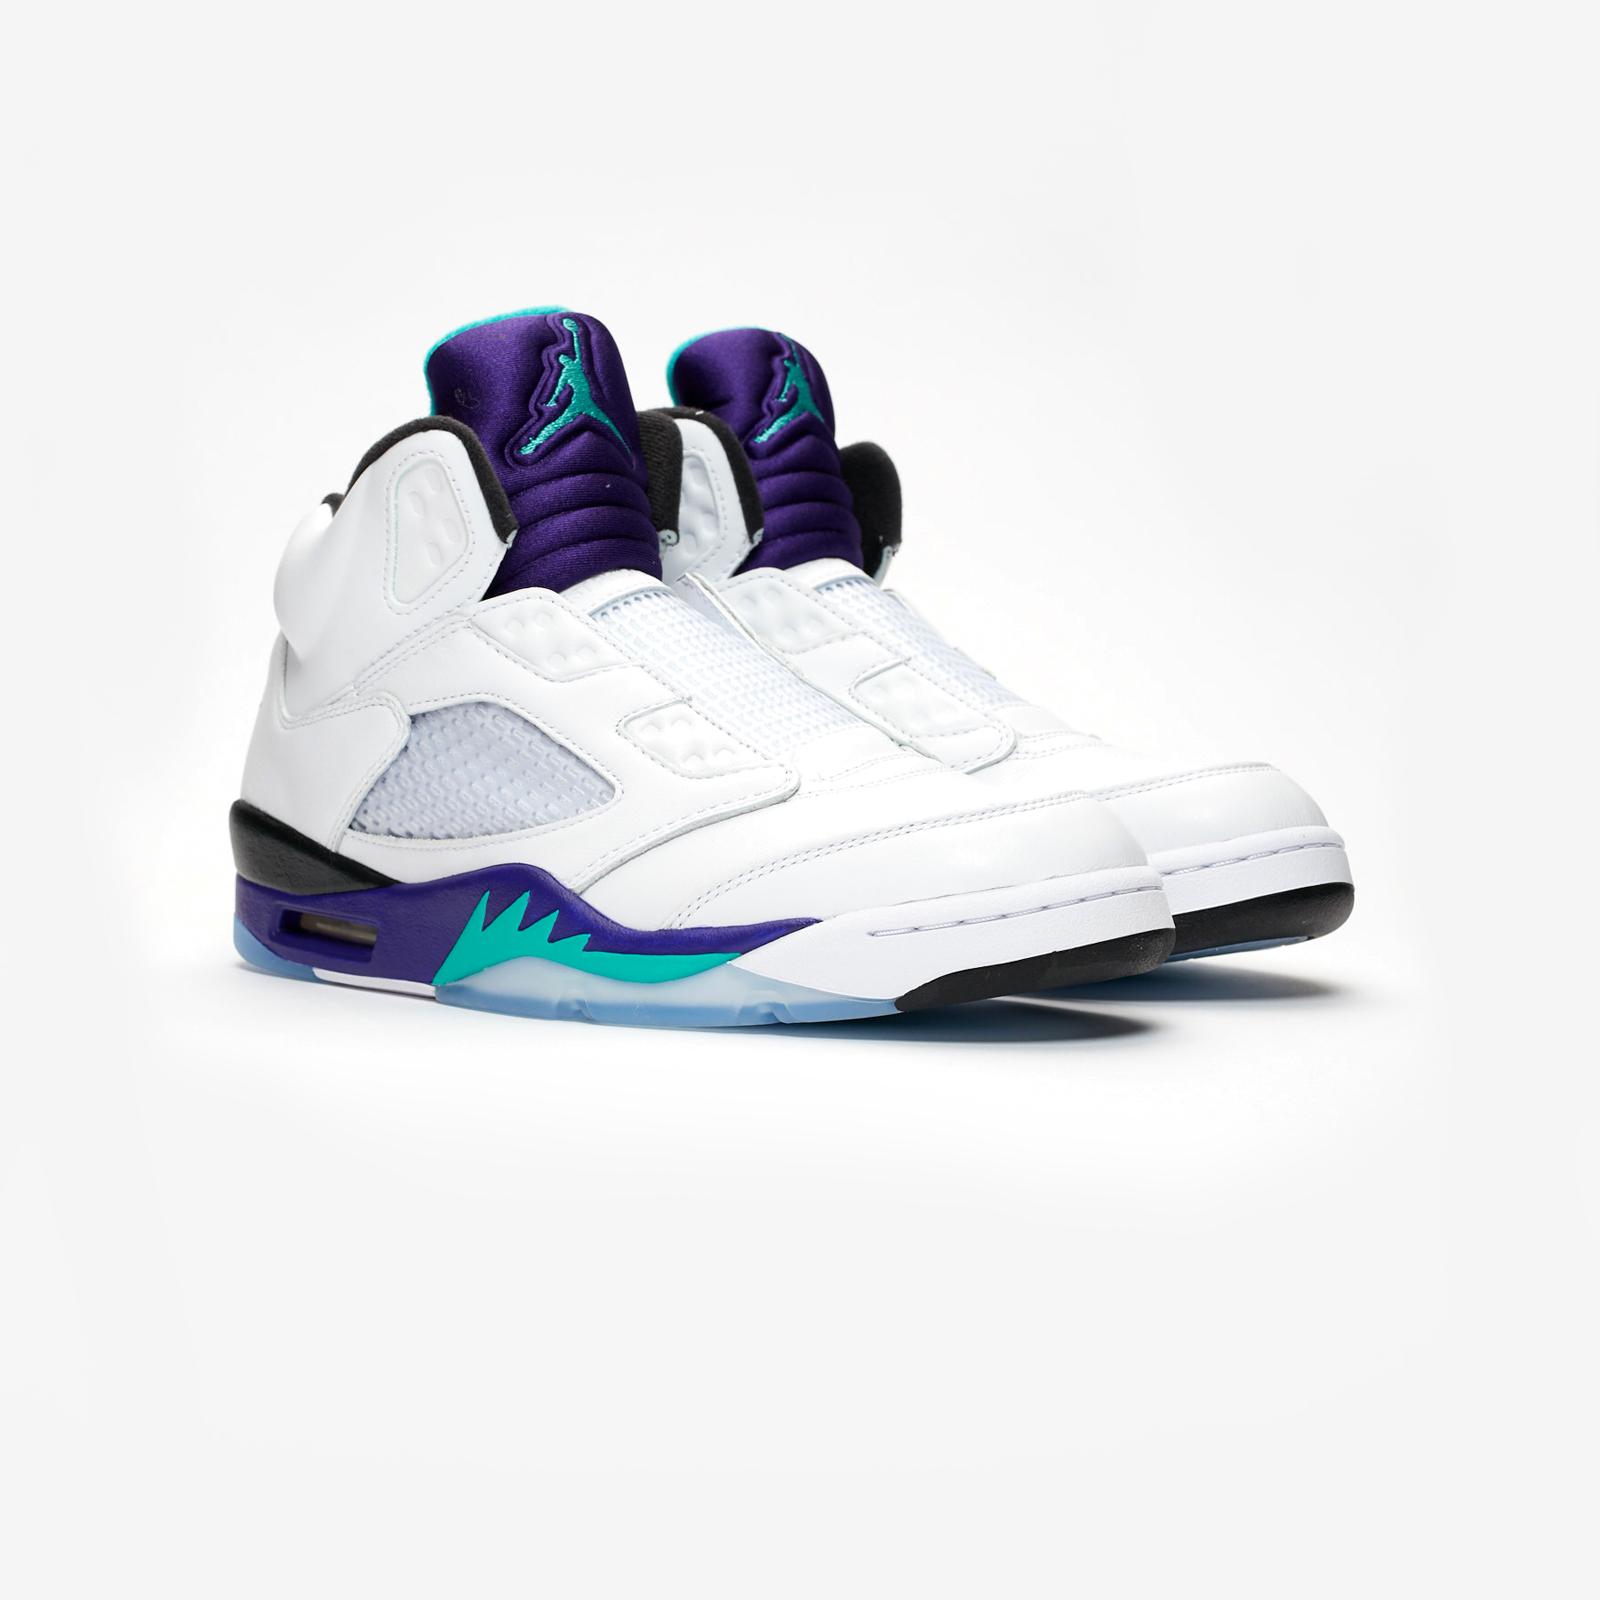 6a782dbc2cd Jordan Brand Air Jordan 5 Retro NRG - Av3919-135 - Sneakersnstuff ...